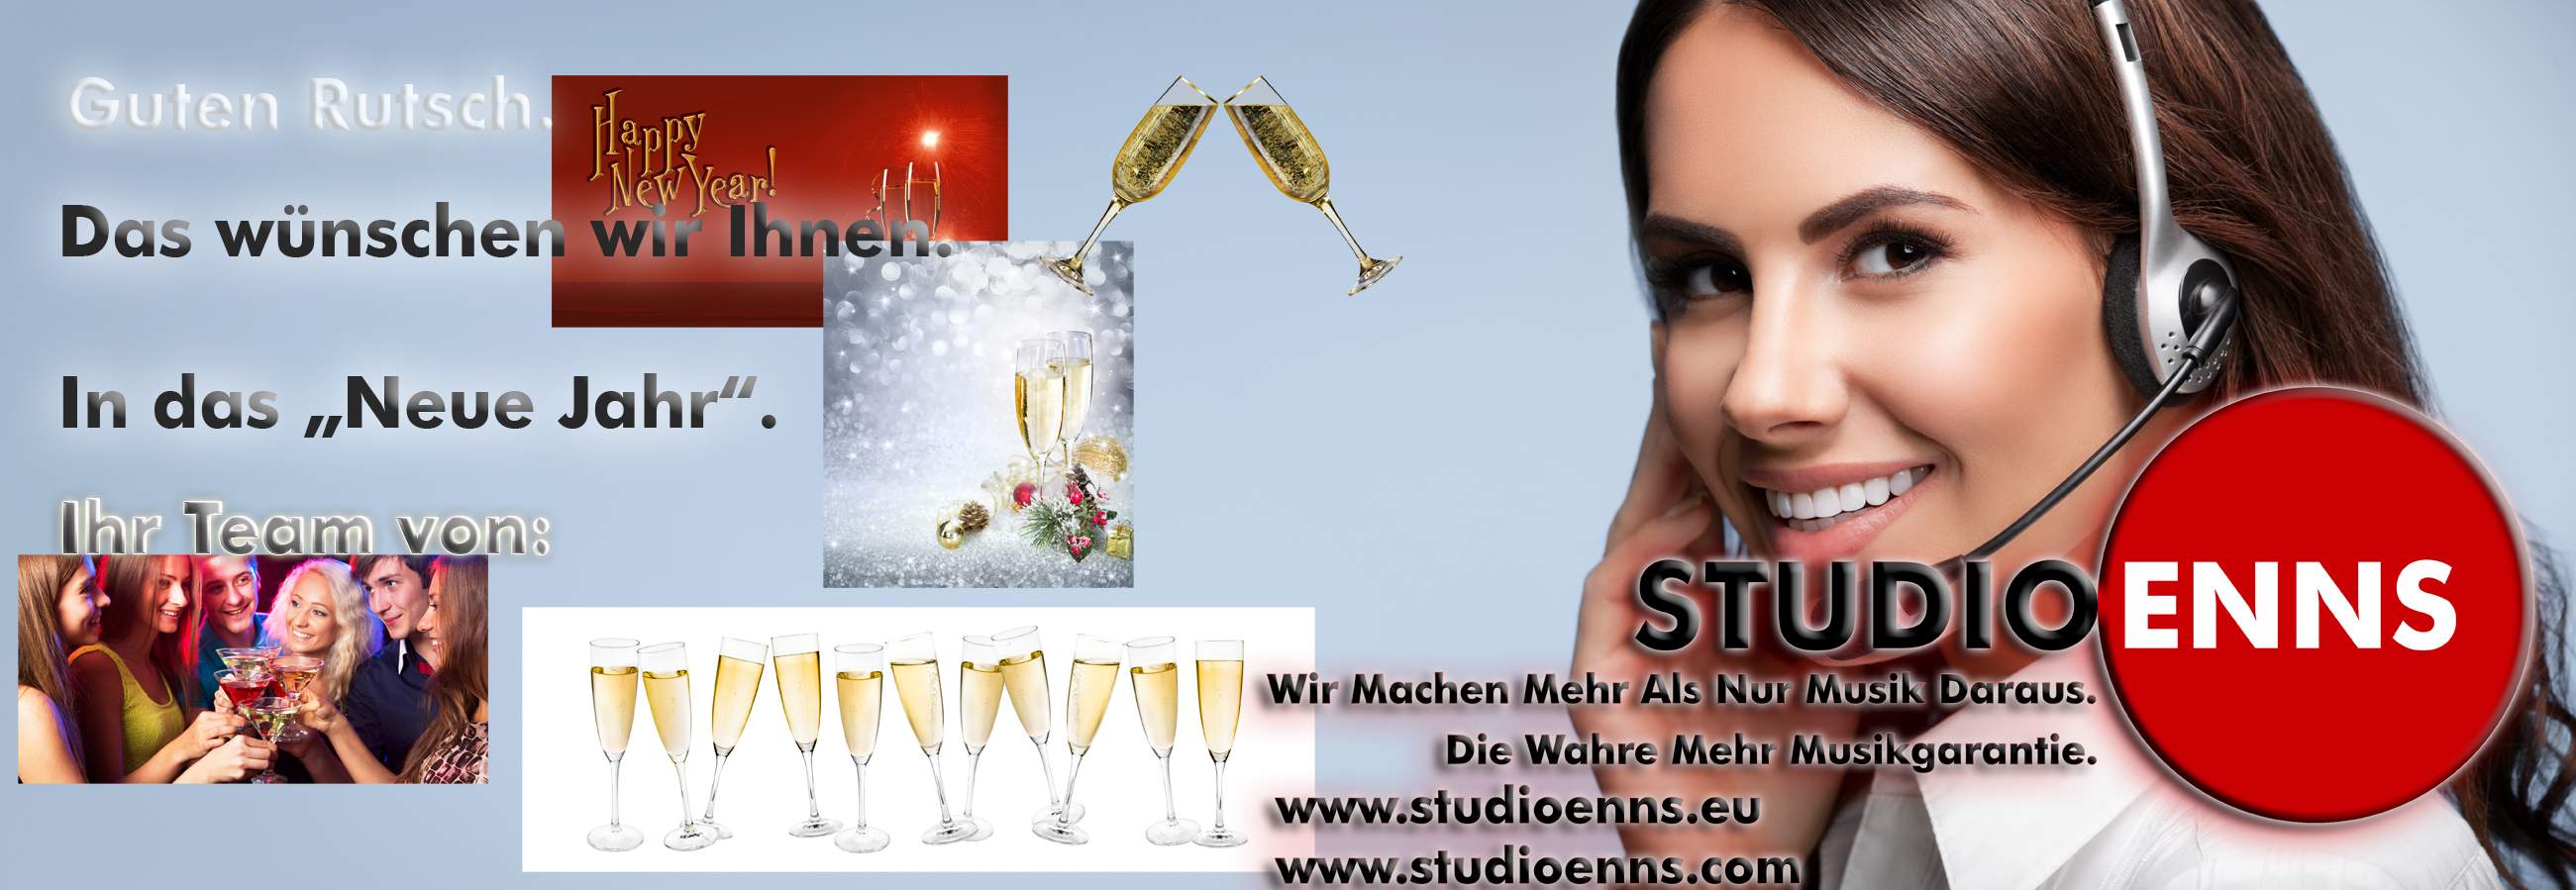 Studio Enns zu Silvester